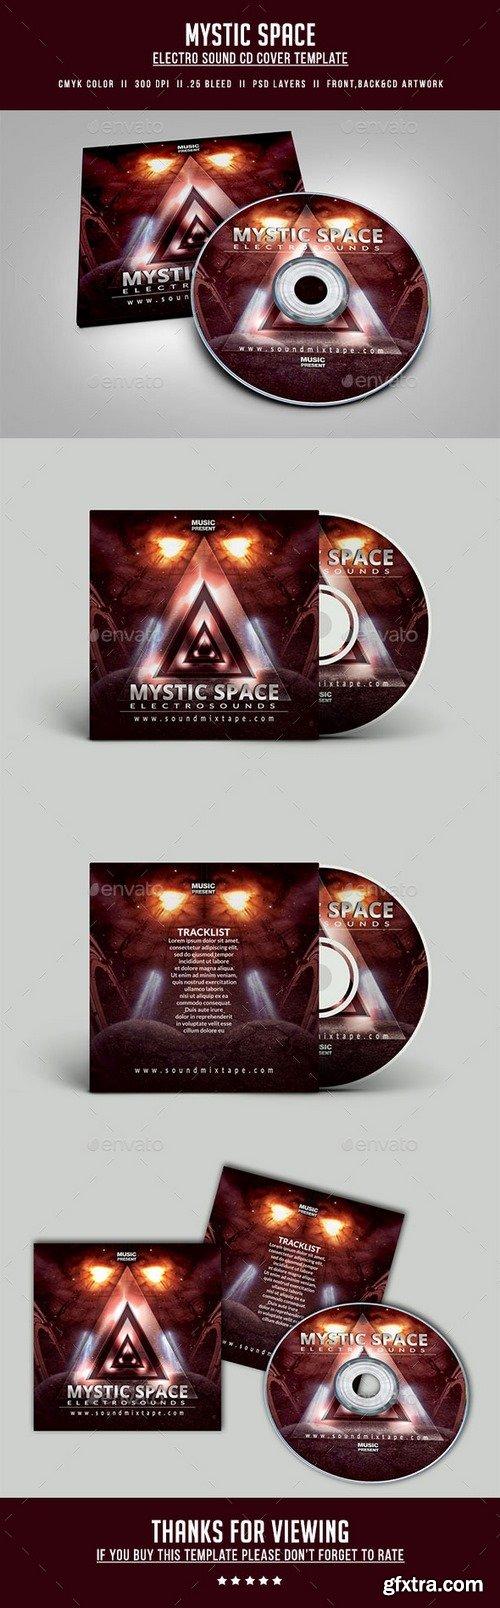 Graphicriver - CD Cover 11217236